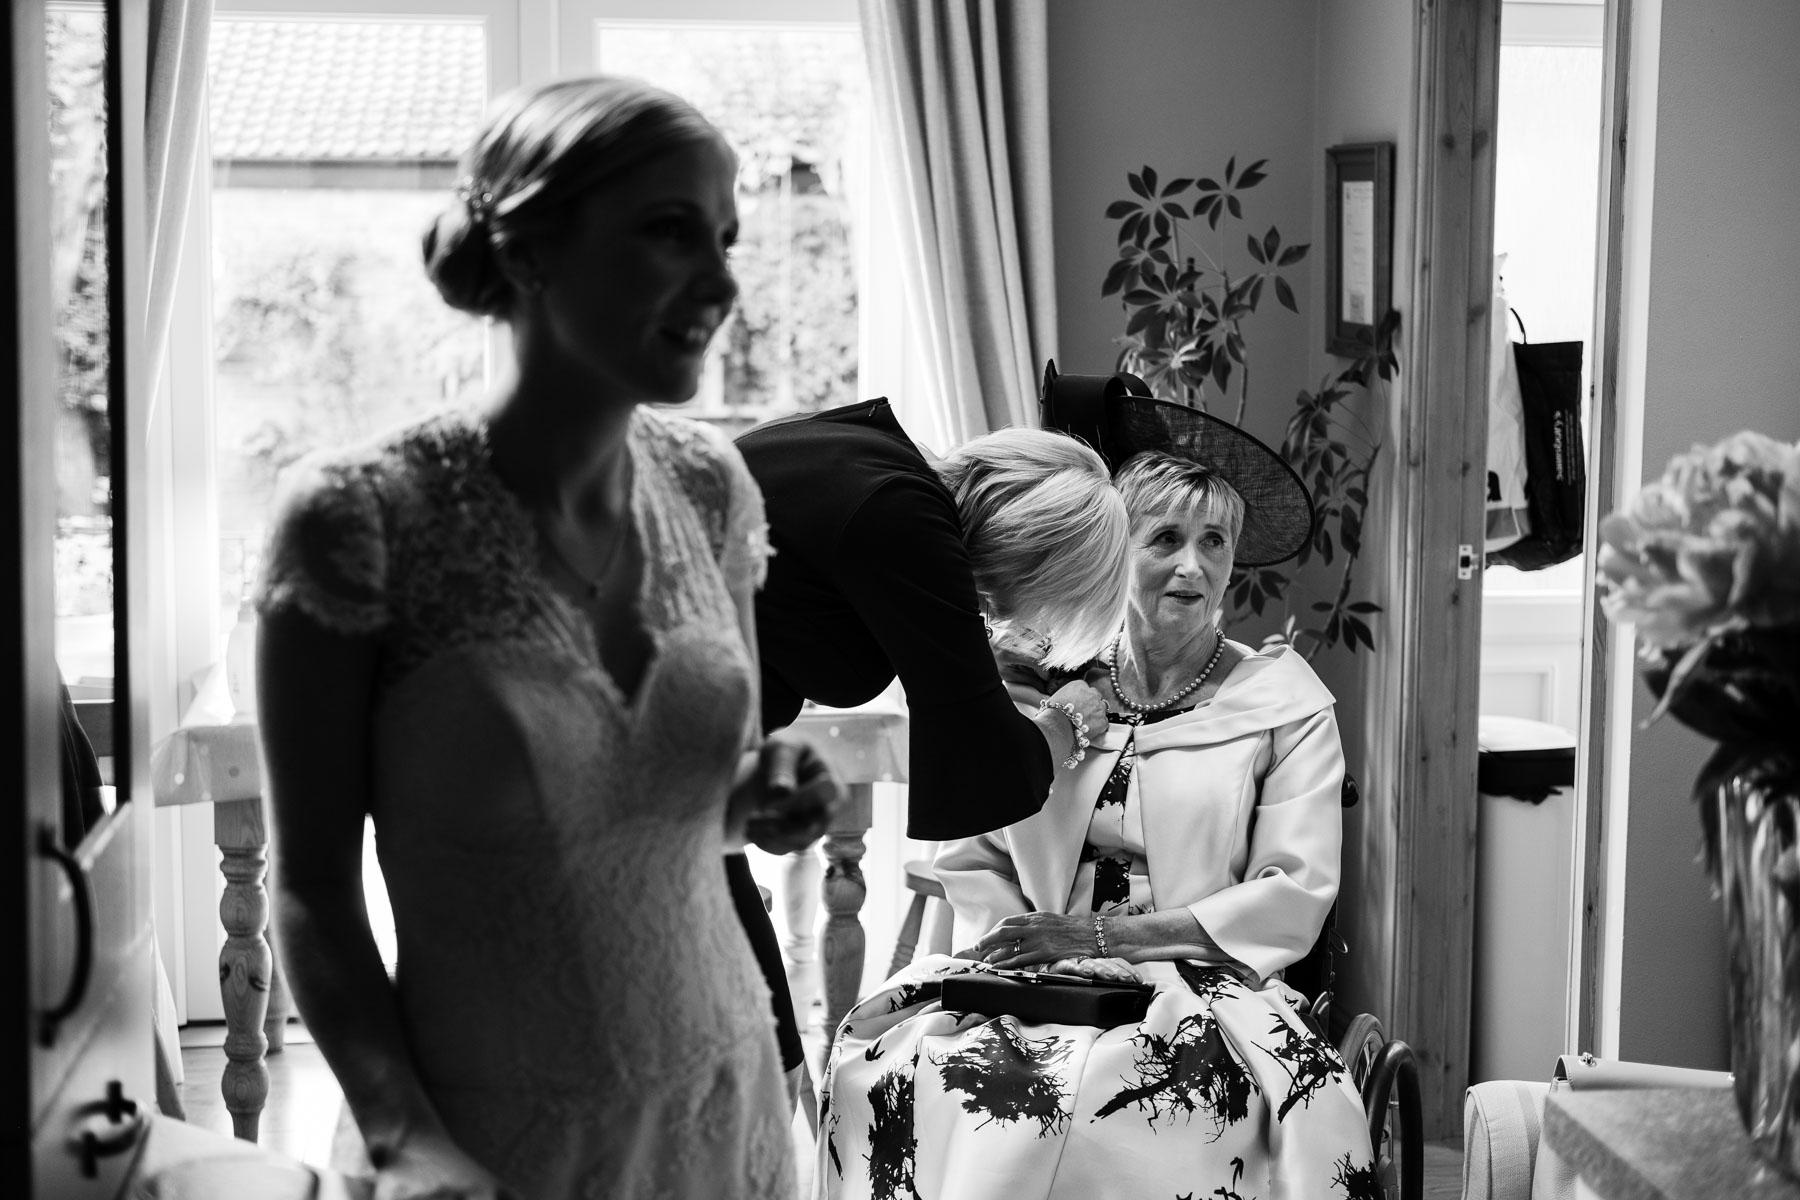 Crathorne Hall Wedding Photography - Jo & Paul (46).jpg